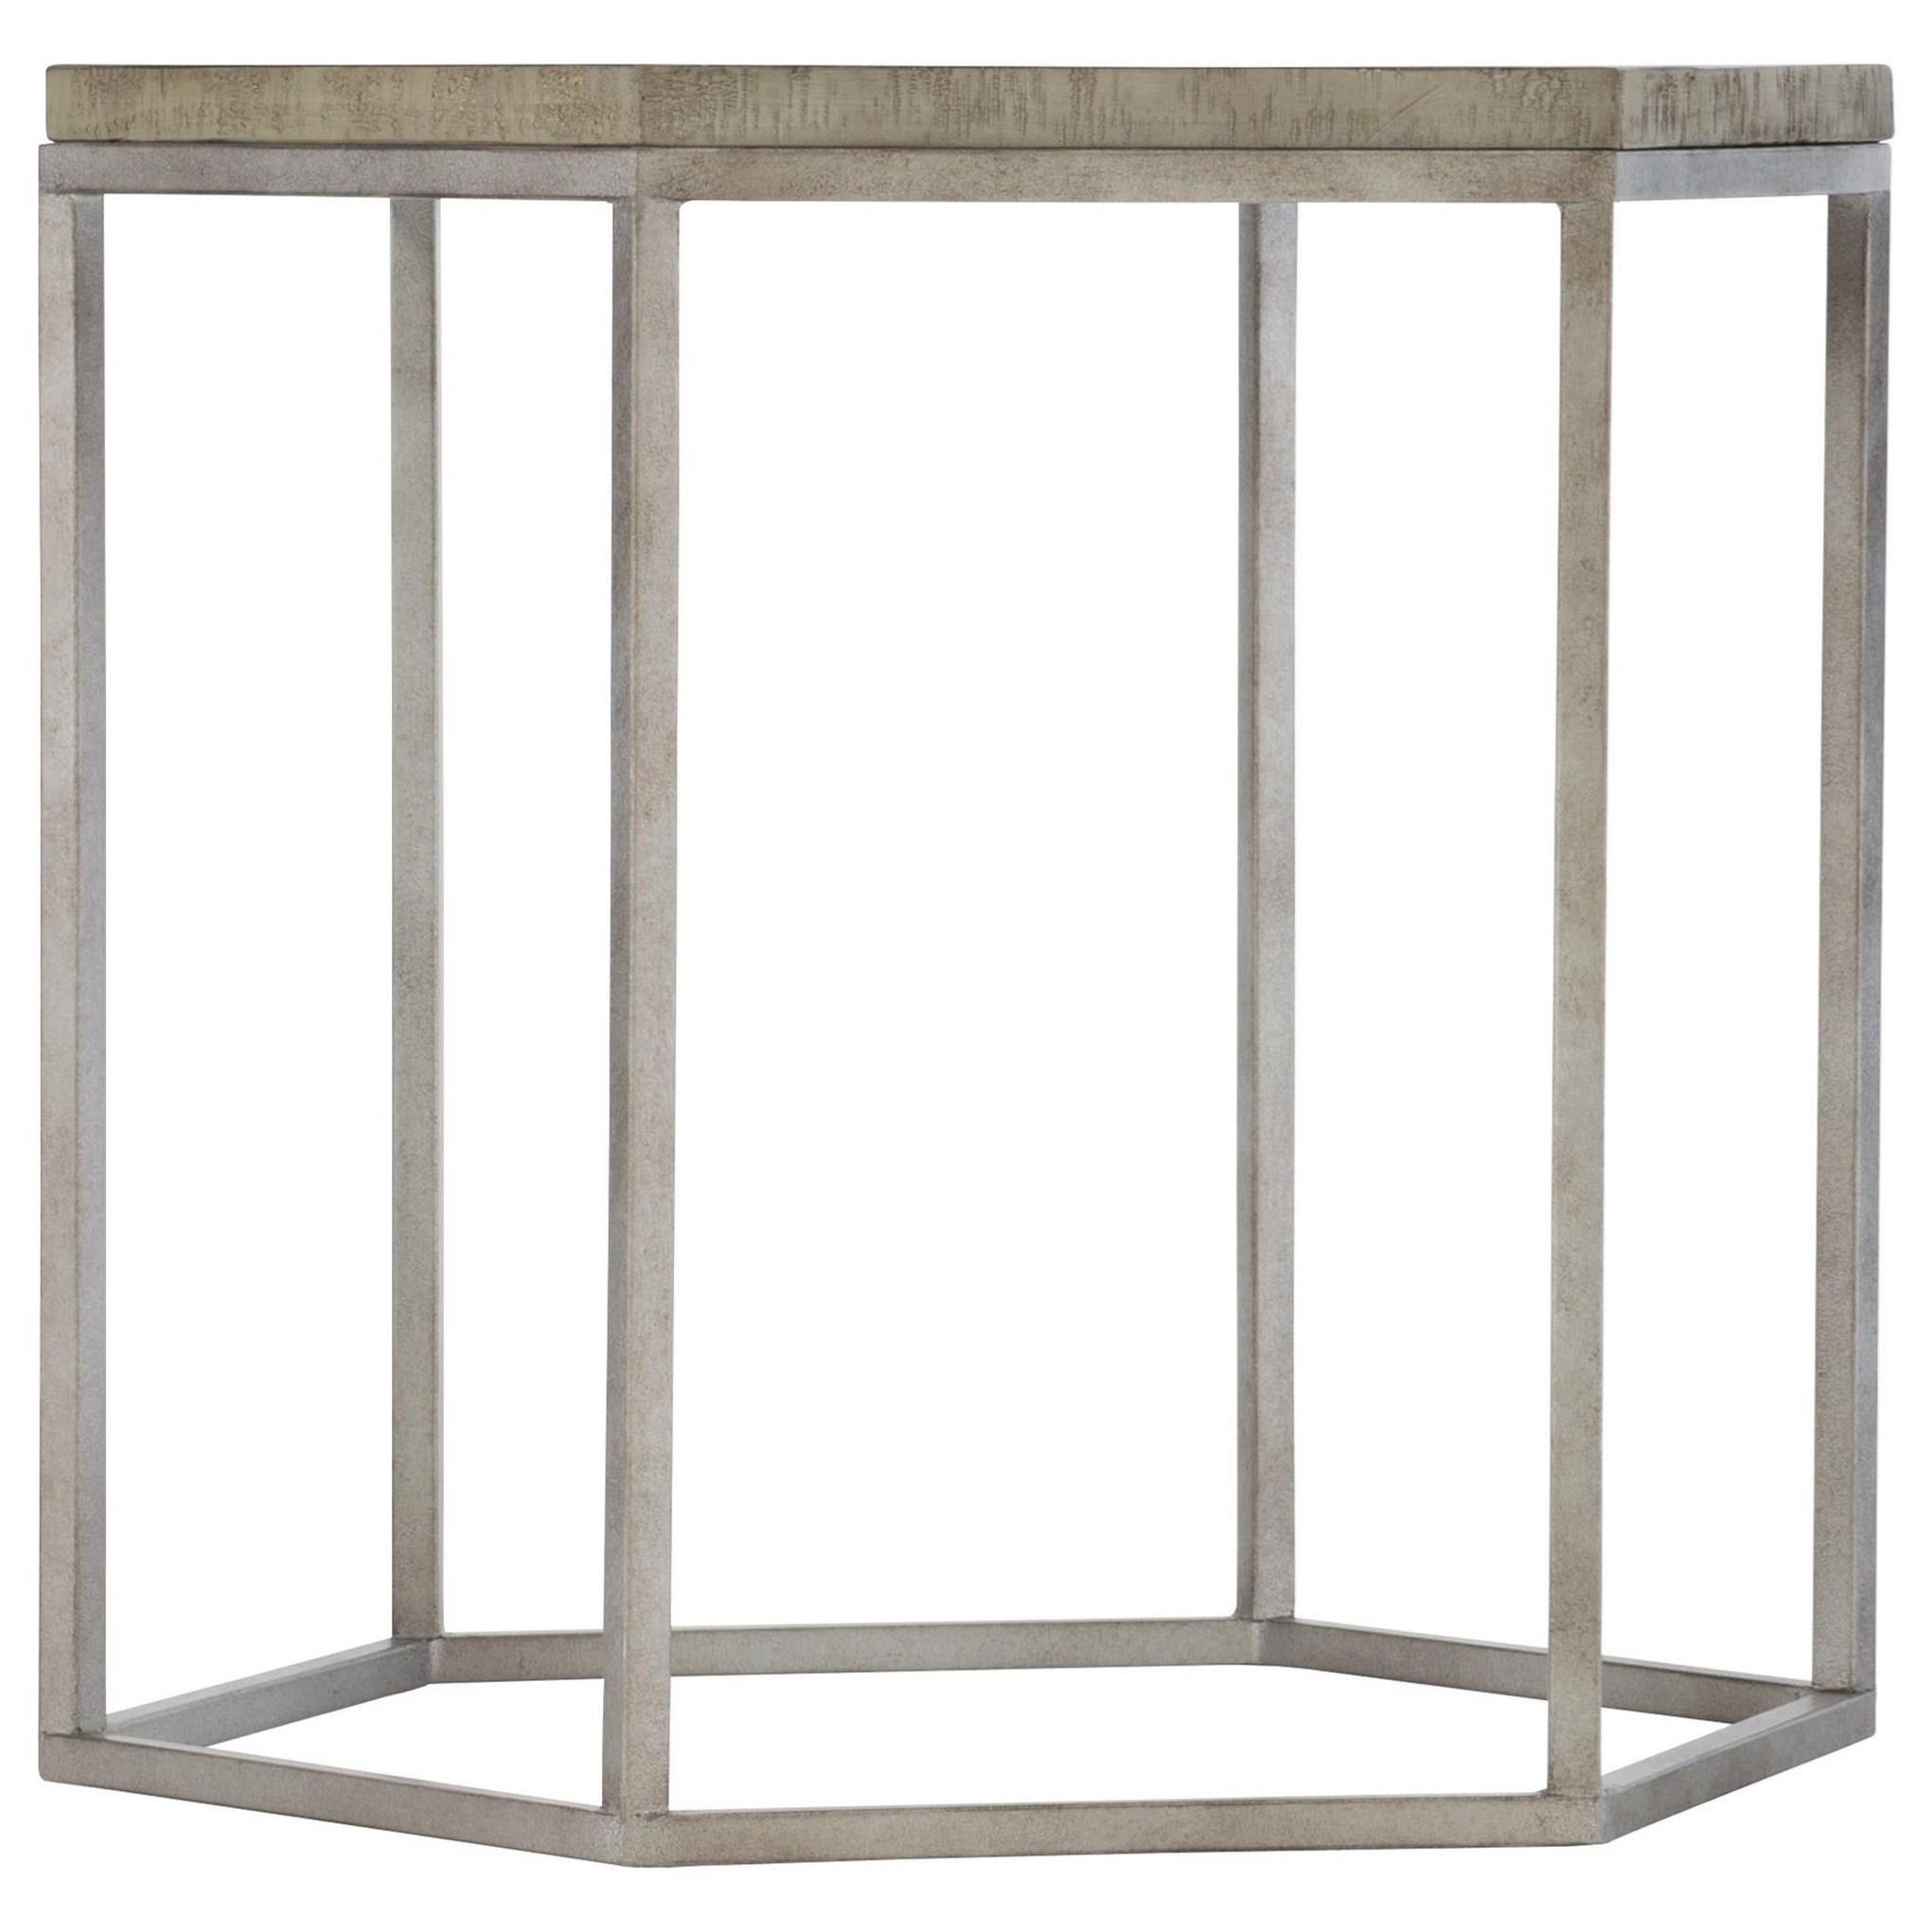 Loft - Highland Park Gresham Hexagonal End Table by Bernhardt at Baer's Furniture